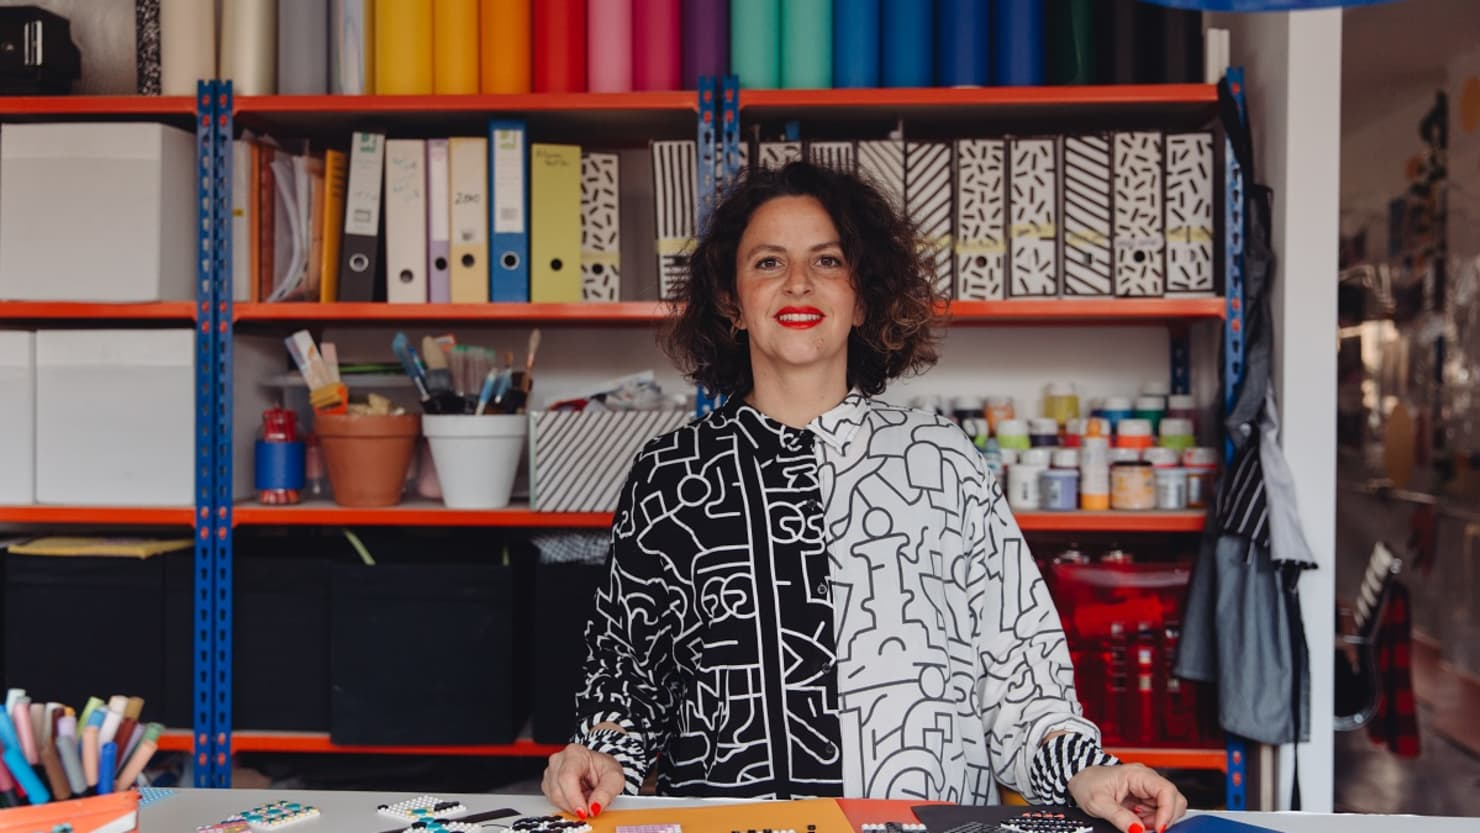 The Box | Artist Camille Walala to create new public artwork for Tavistock Place